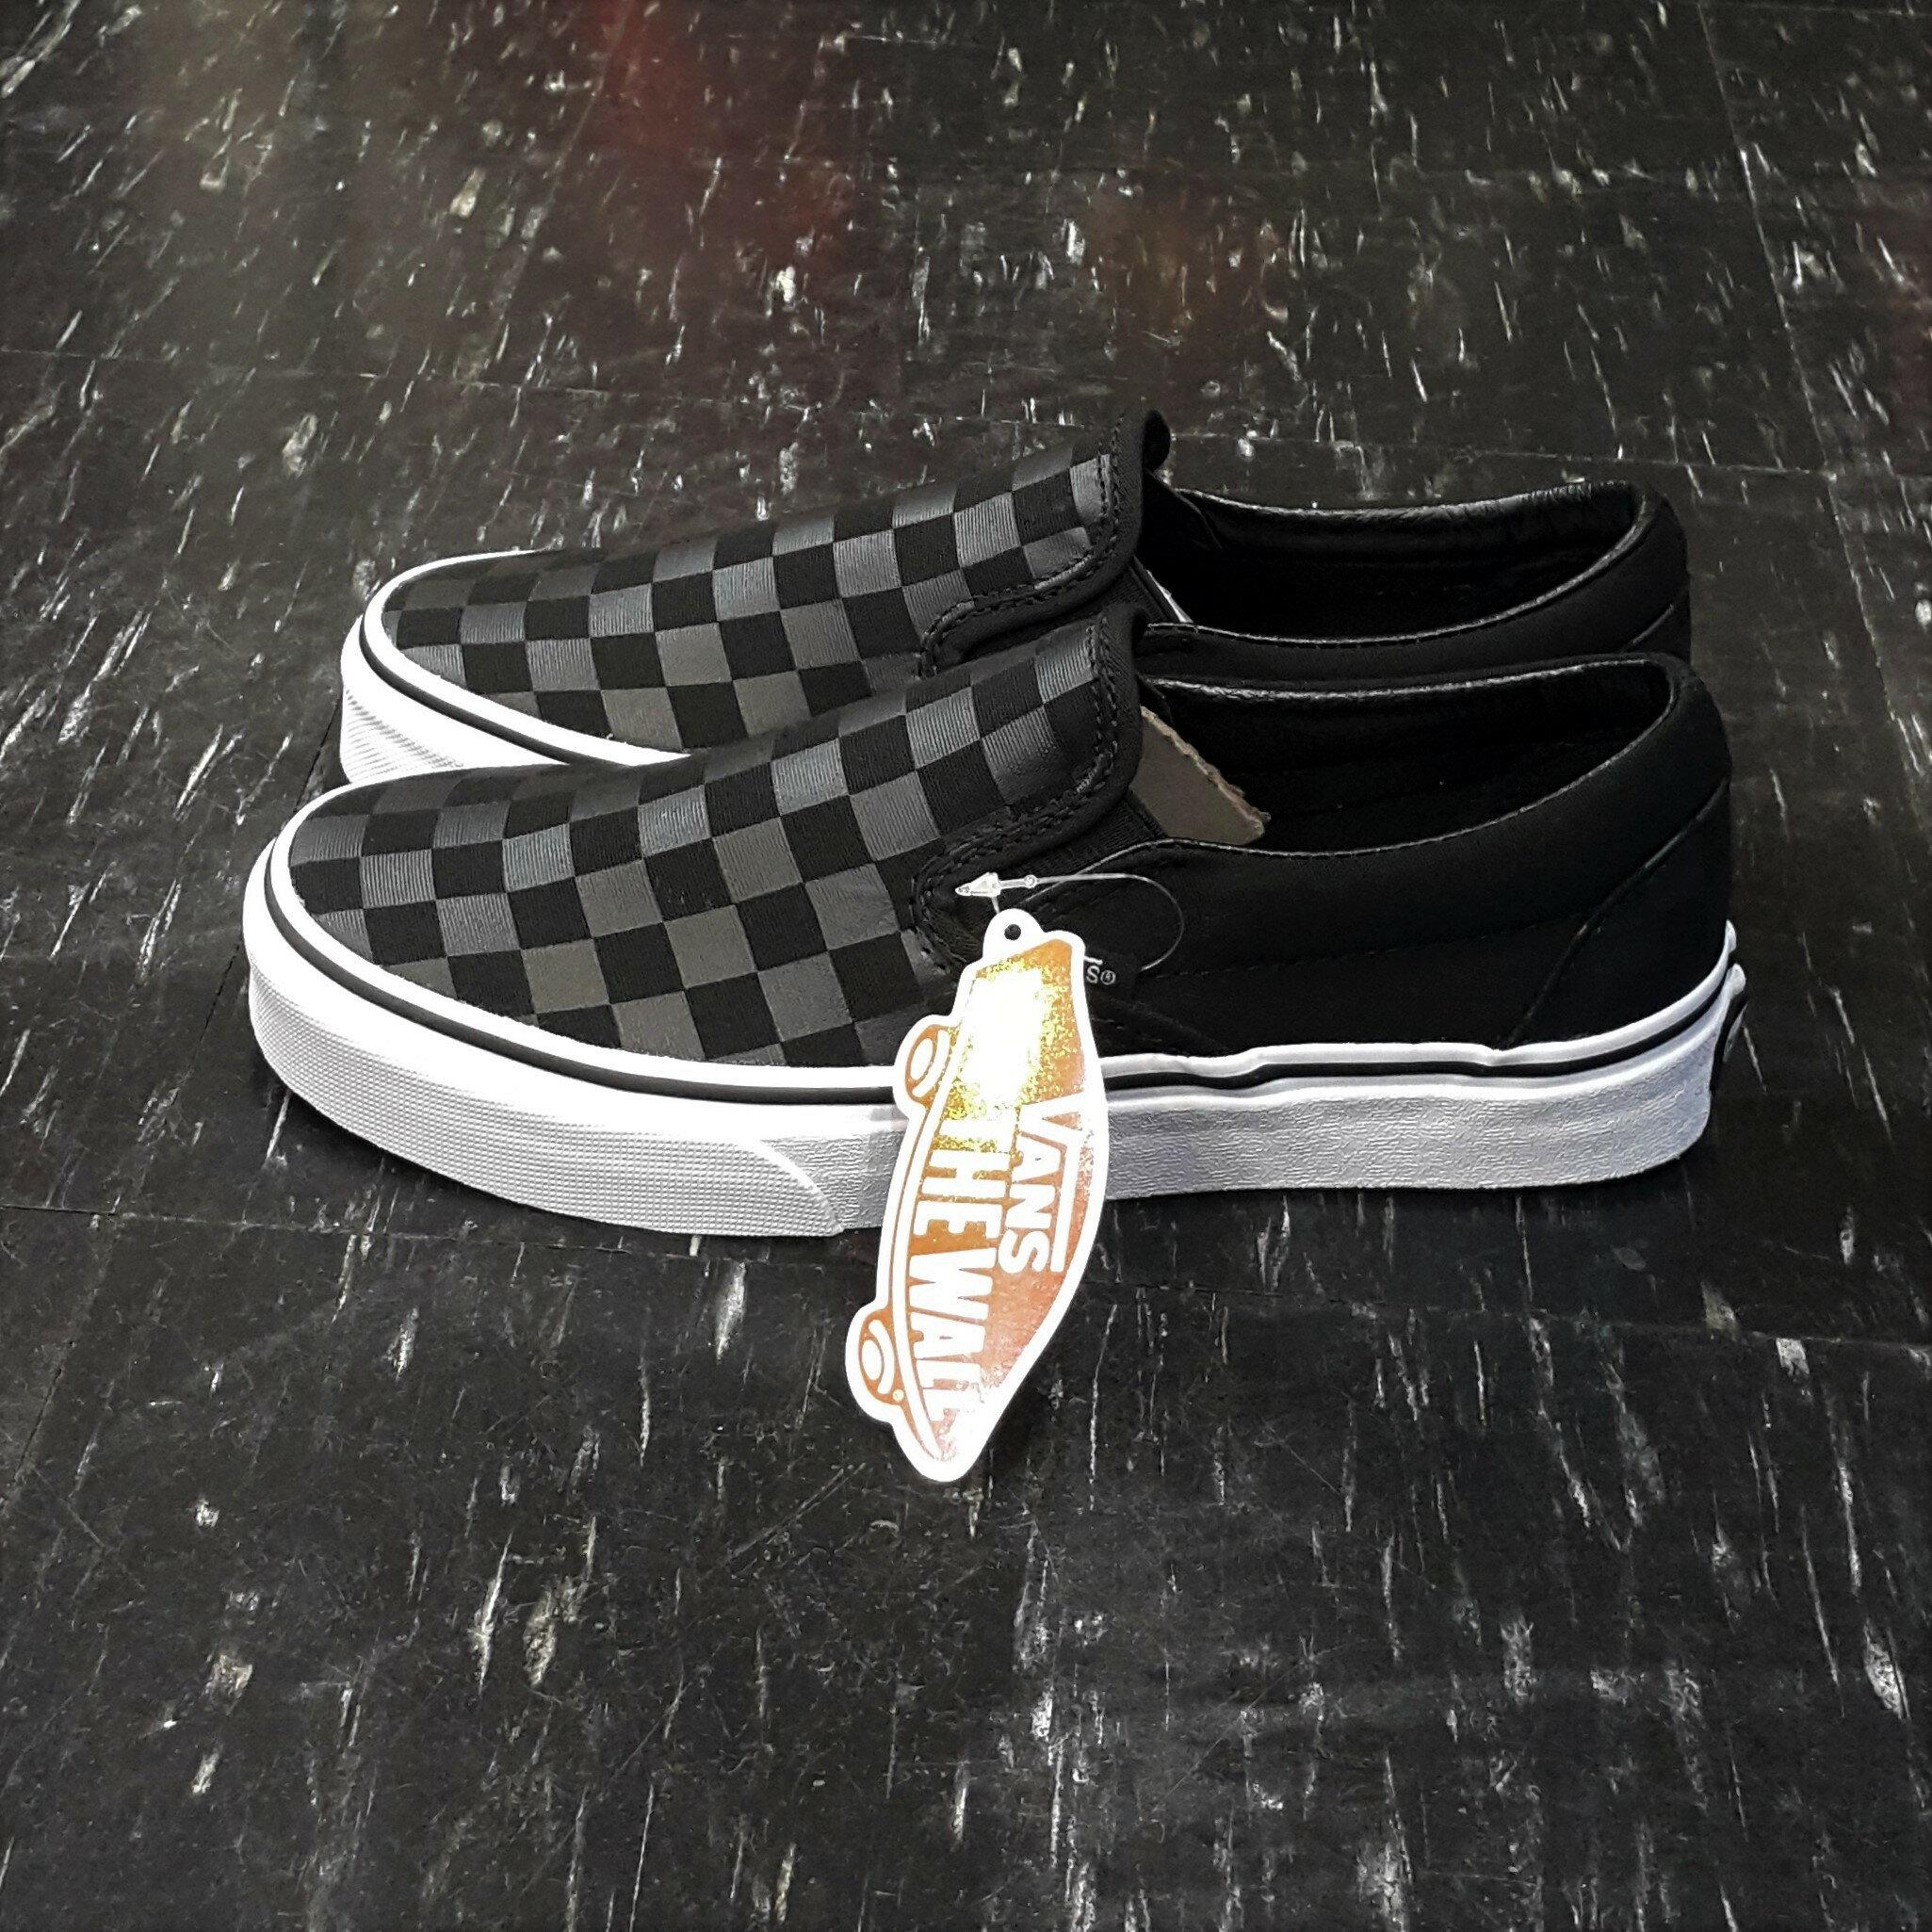 VANS Classic Slip On Checkerboard Black/Black 棋盤格 懶人鞋 黑白 黑色 白色 全黑 方格